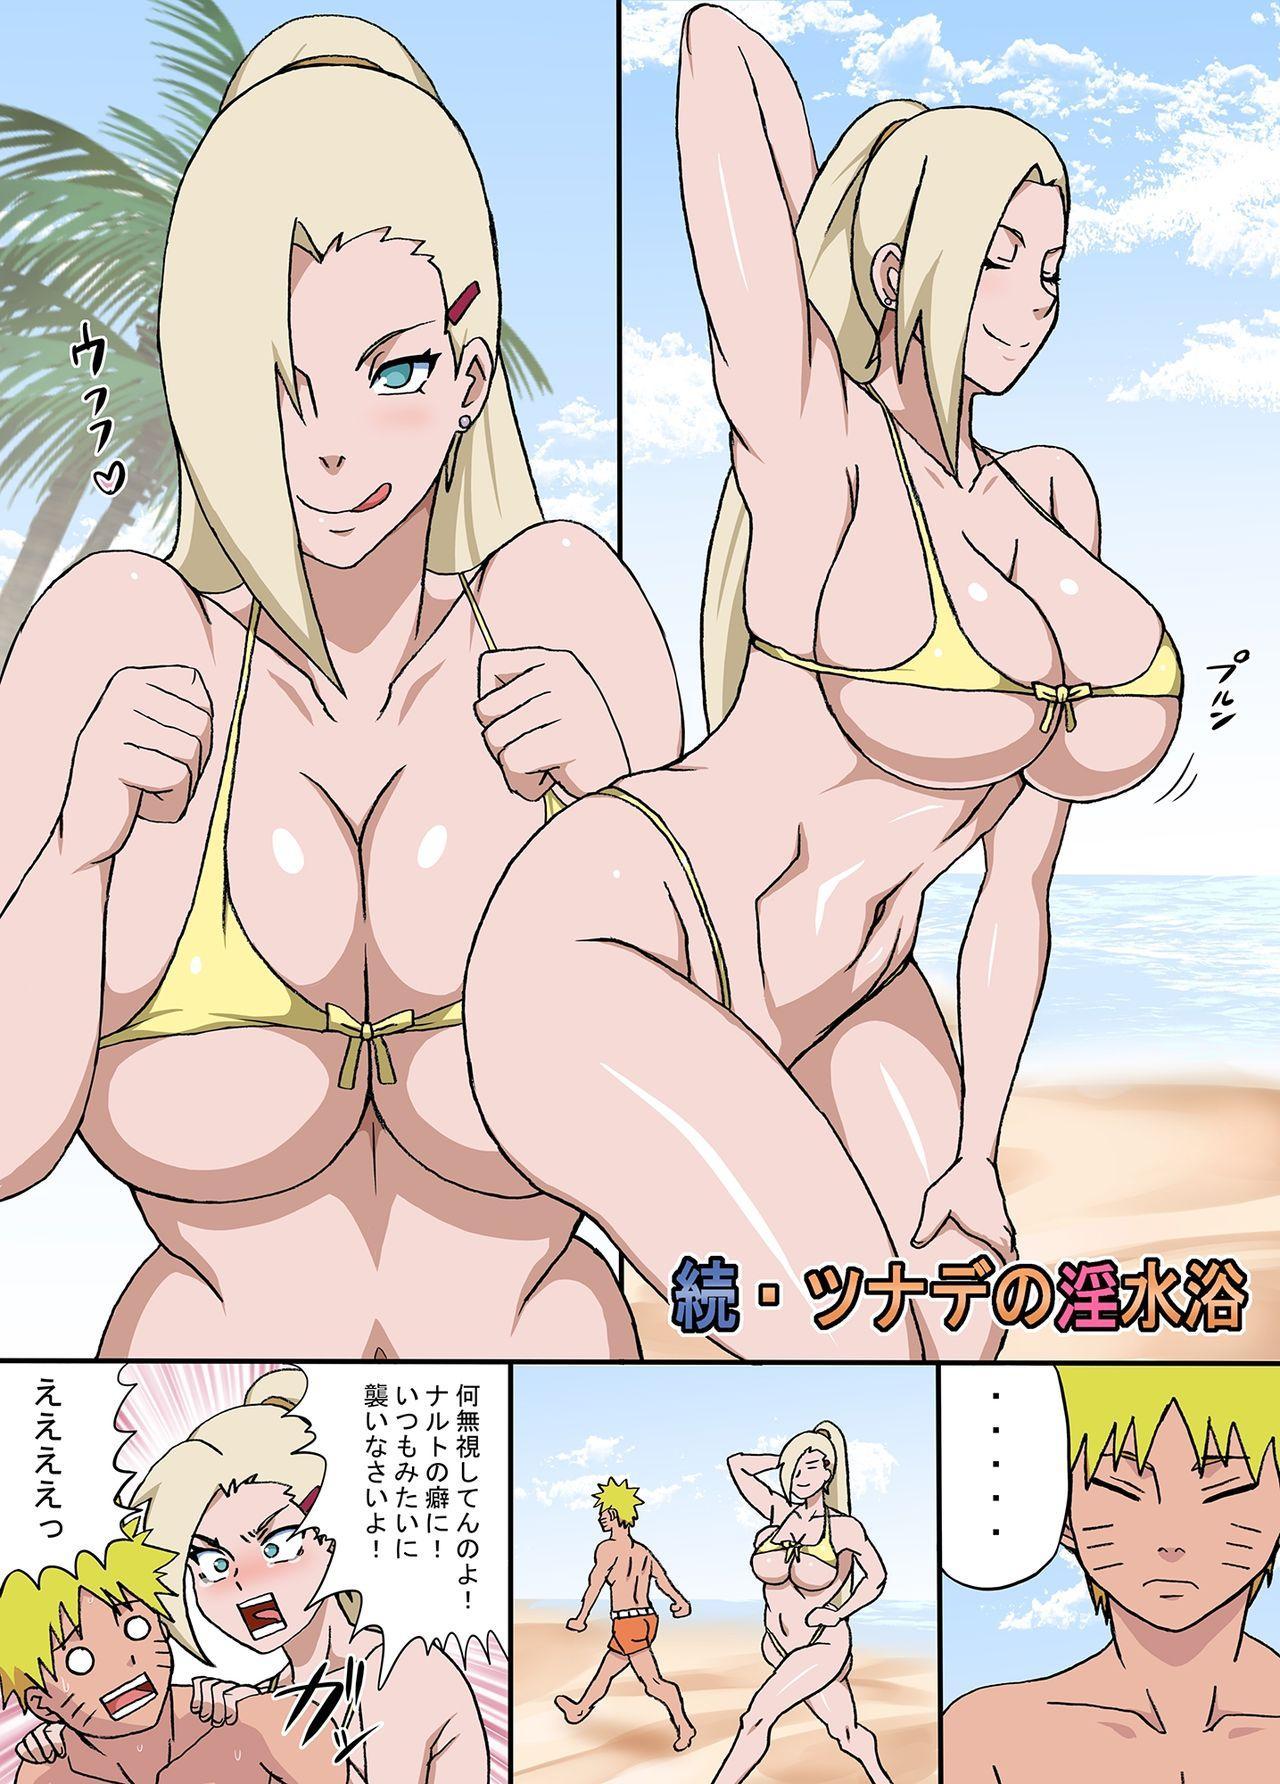 Naruho (Naruho-dou) - After Tsunade Beach Obscene (Complete Version) 8